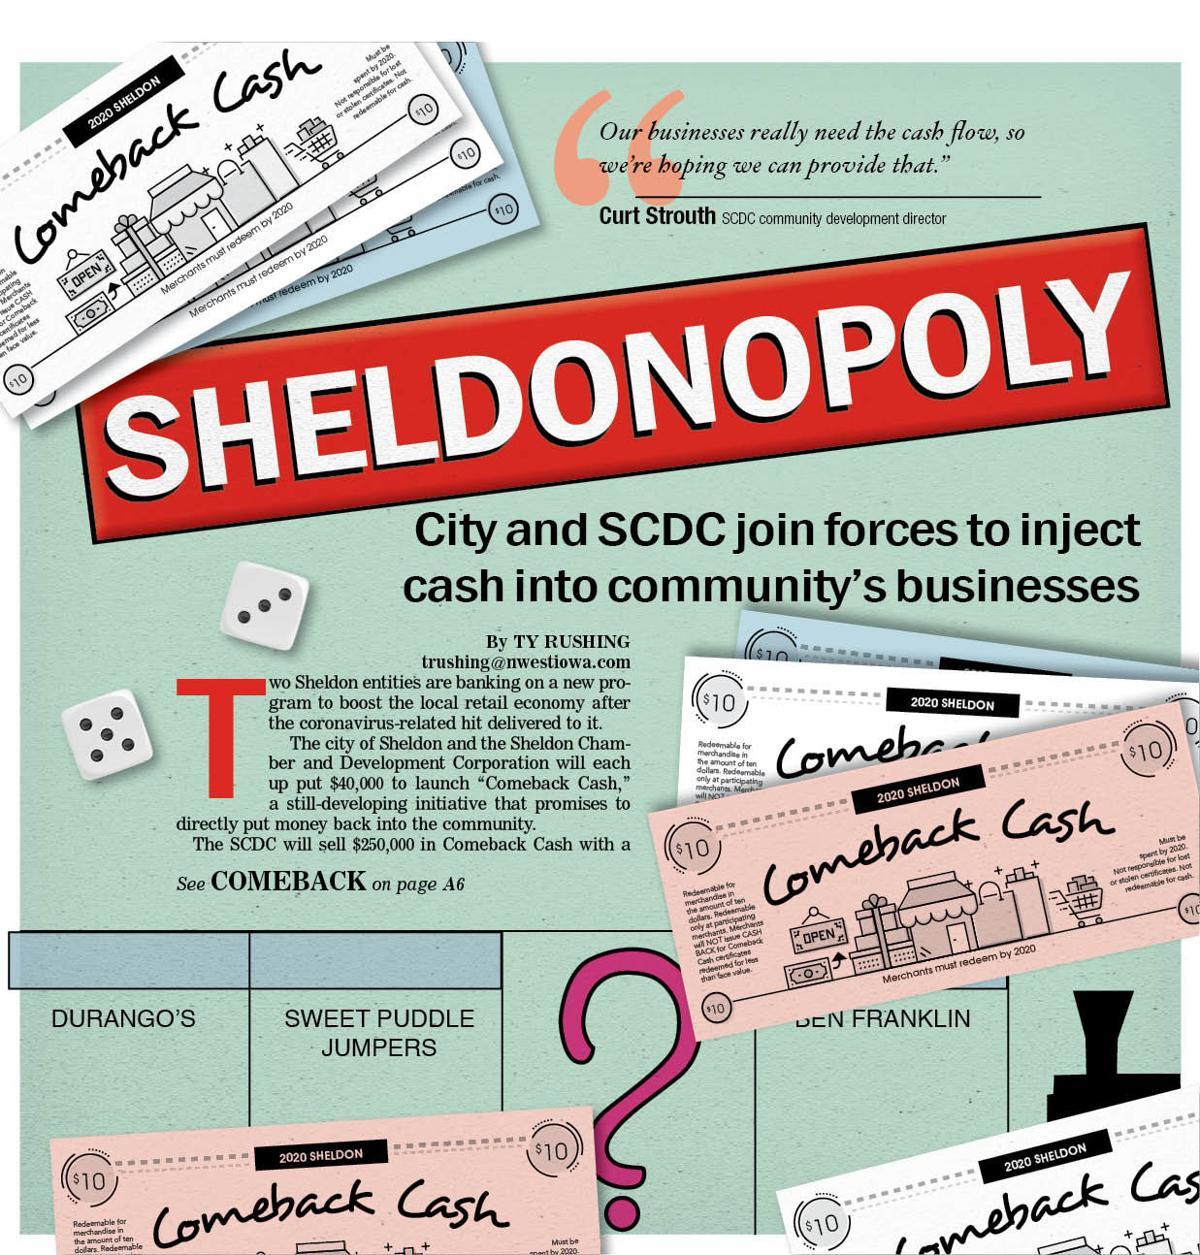 Sheldonopoly